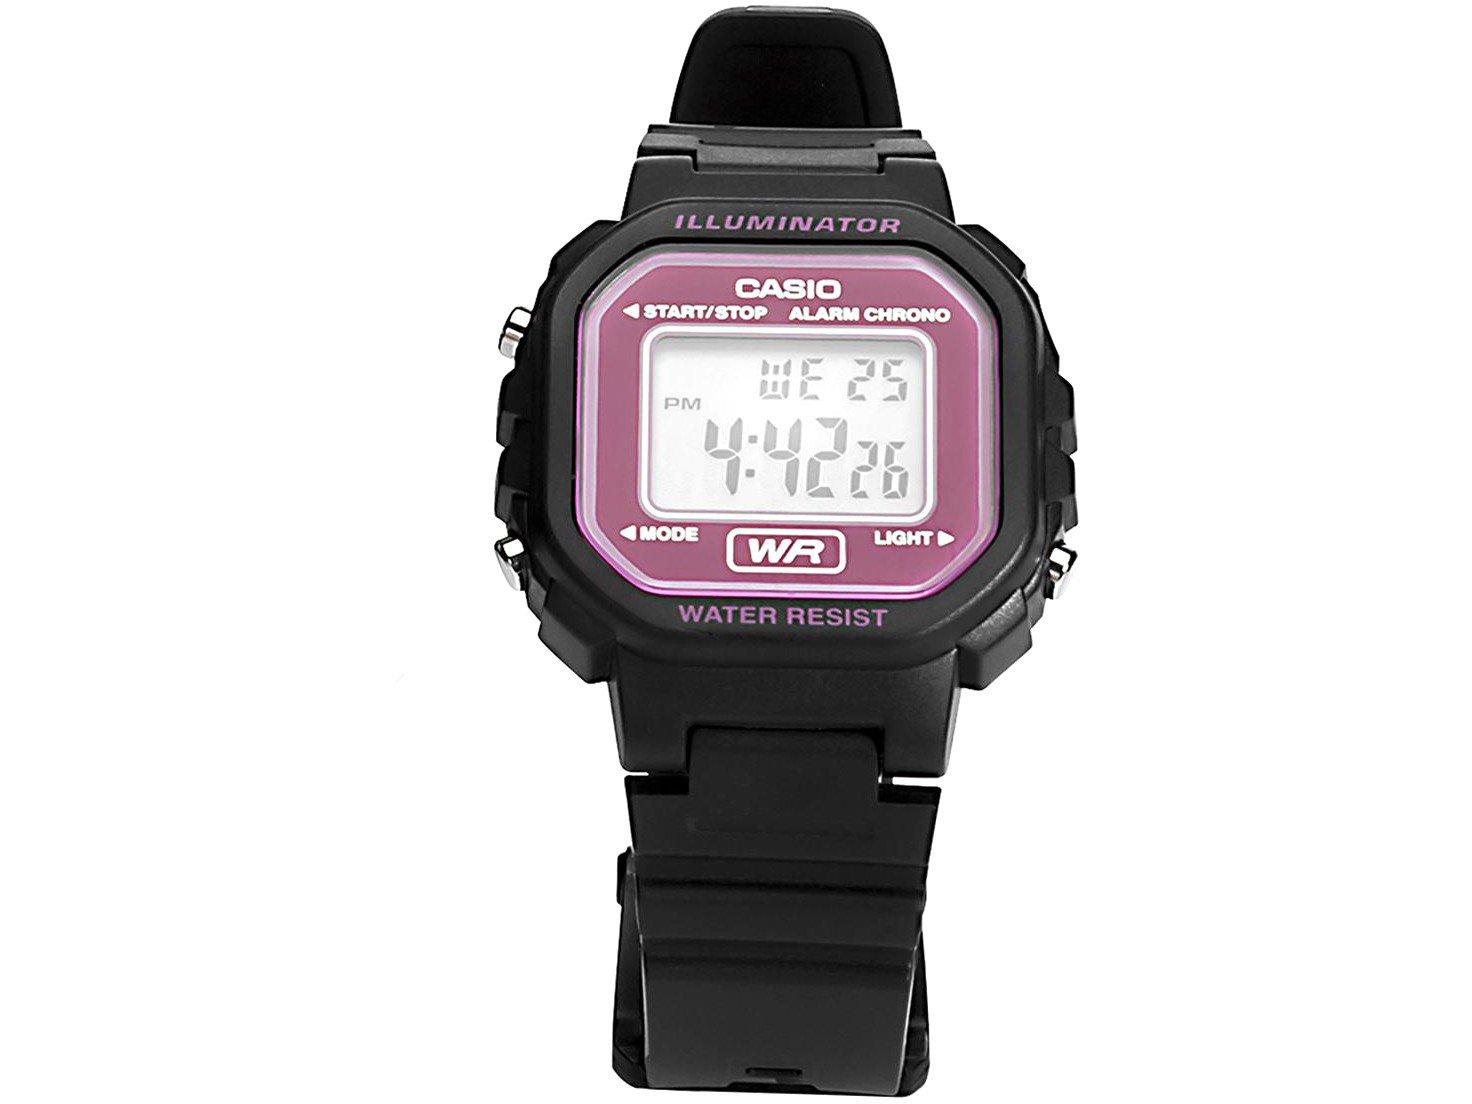 7aa29f3d110 Relógio Feminino Esportivo Digital Casio - LA-20WH-4ADF - Relógio ...